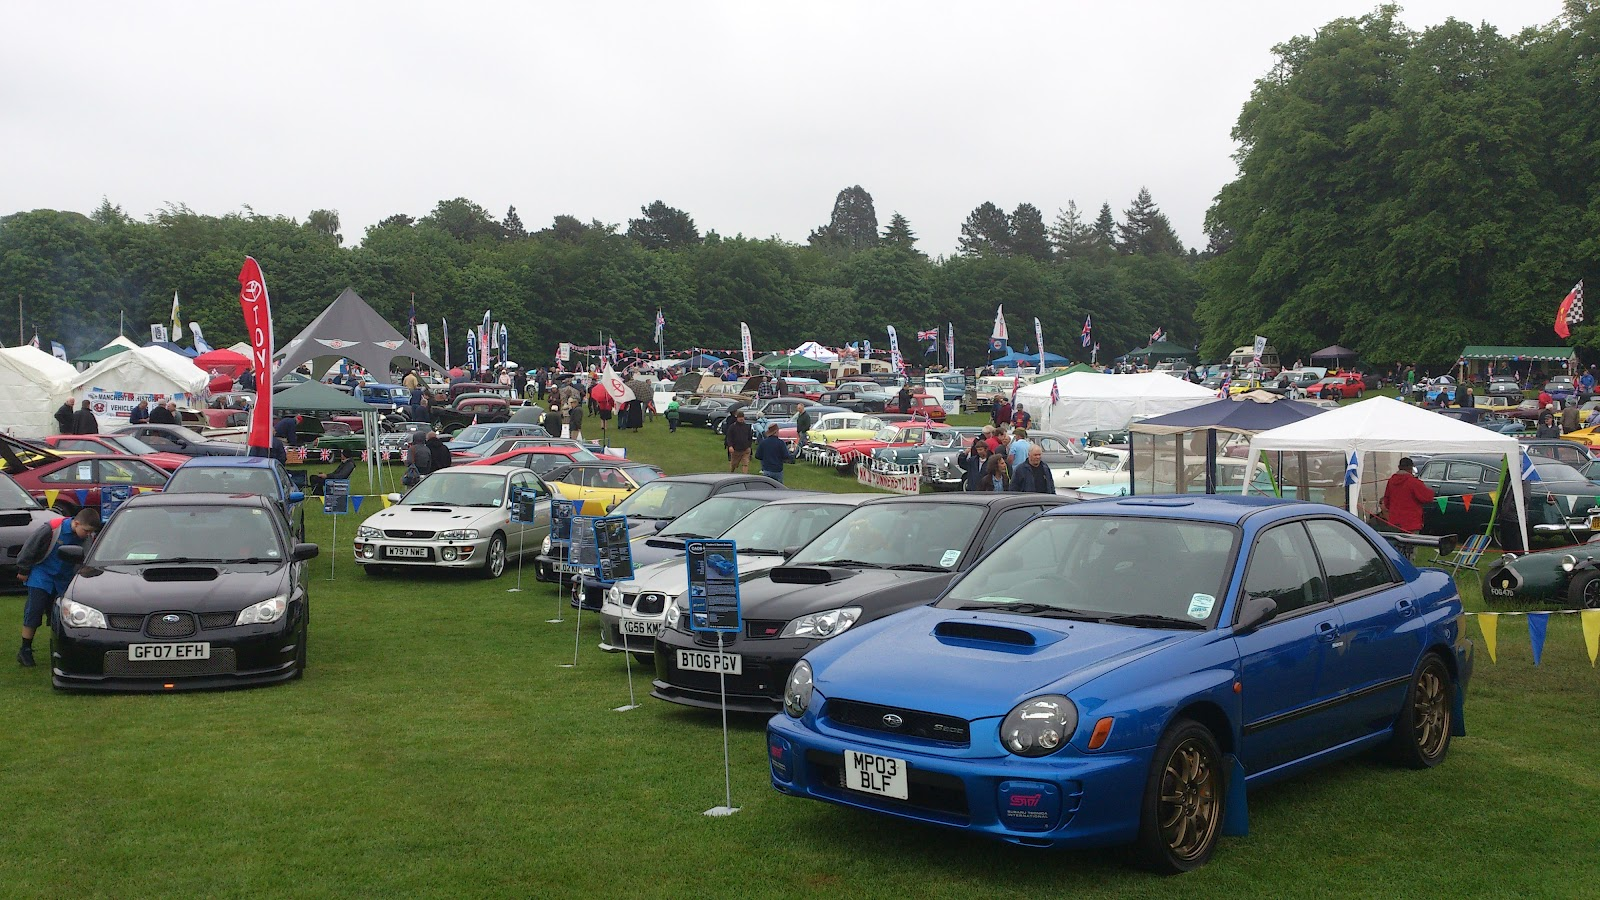 Life On Cars: Tatton Park Classic & Performance Car